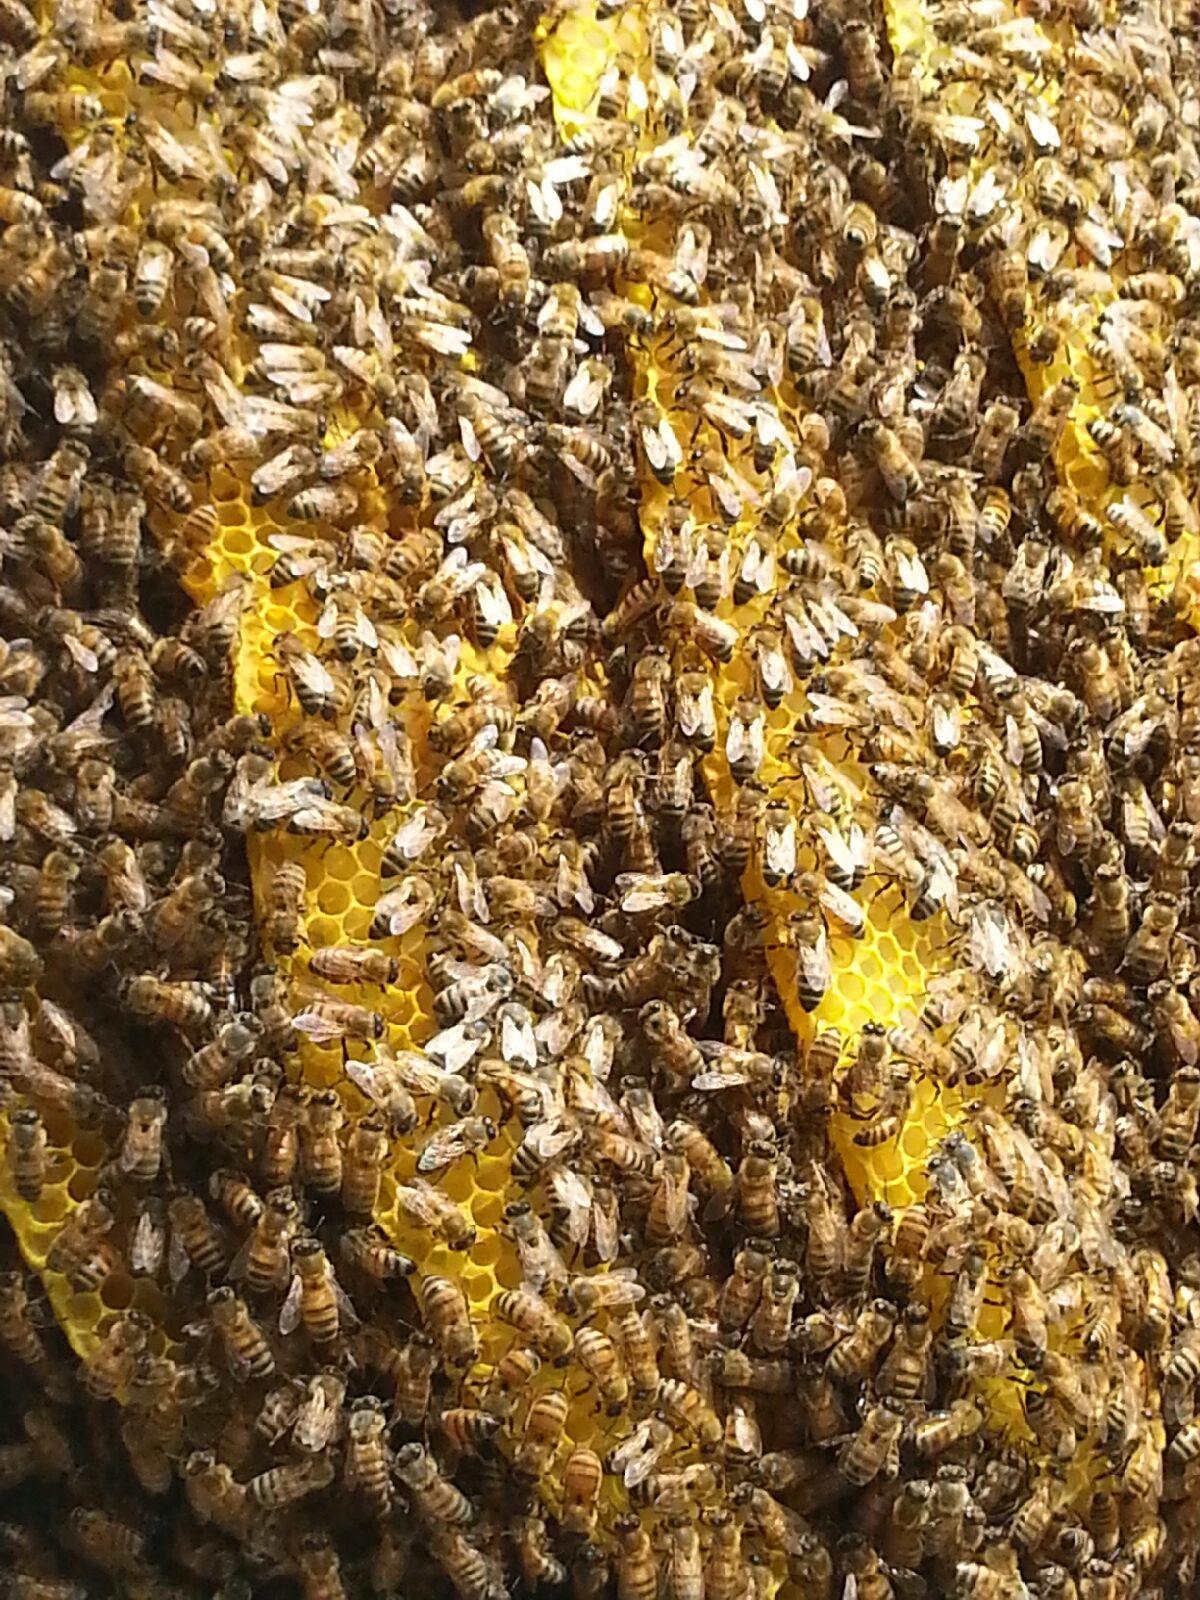 honey bees nest found in Florida